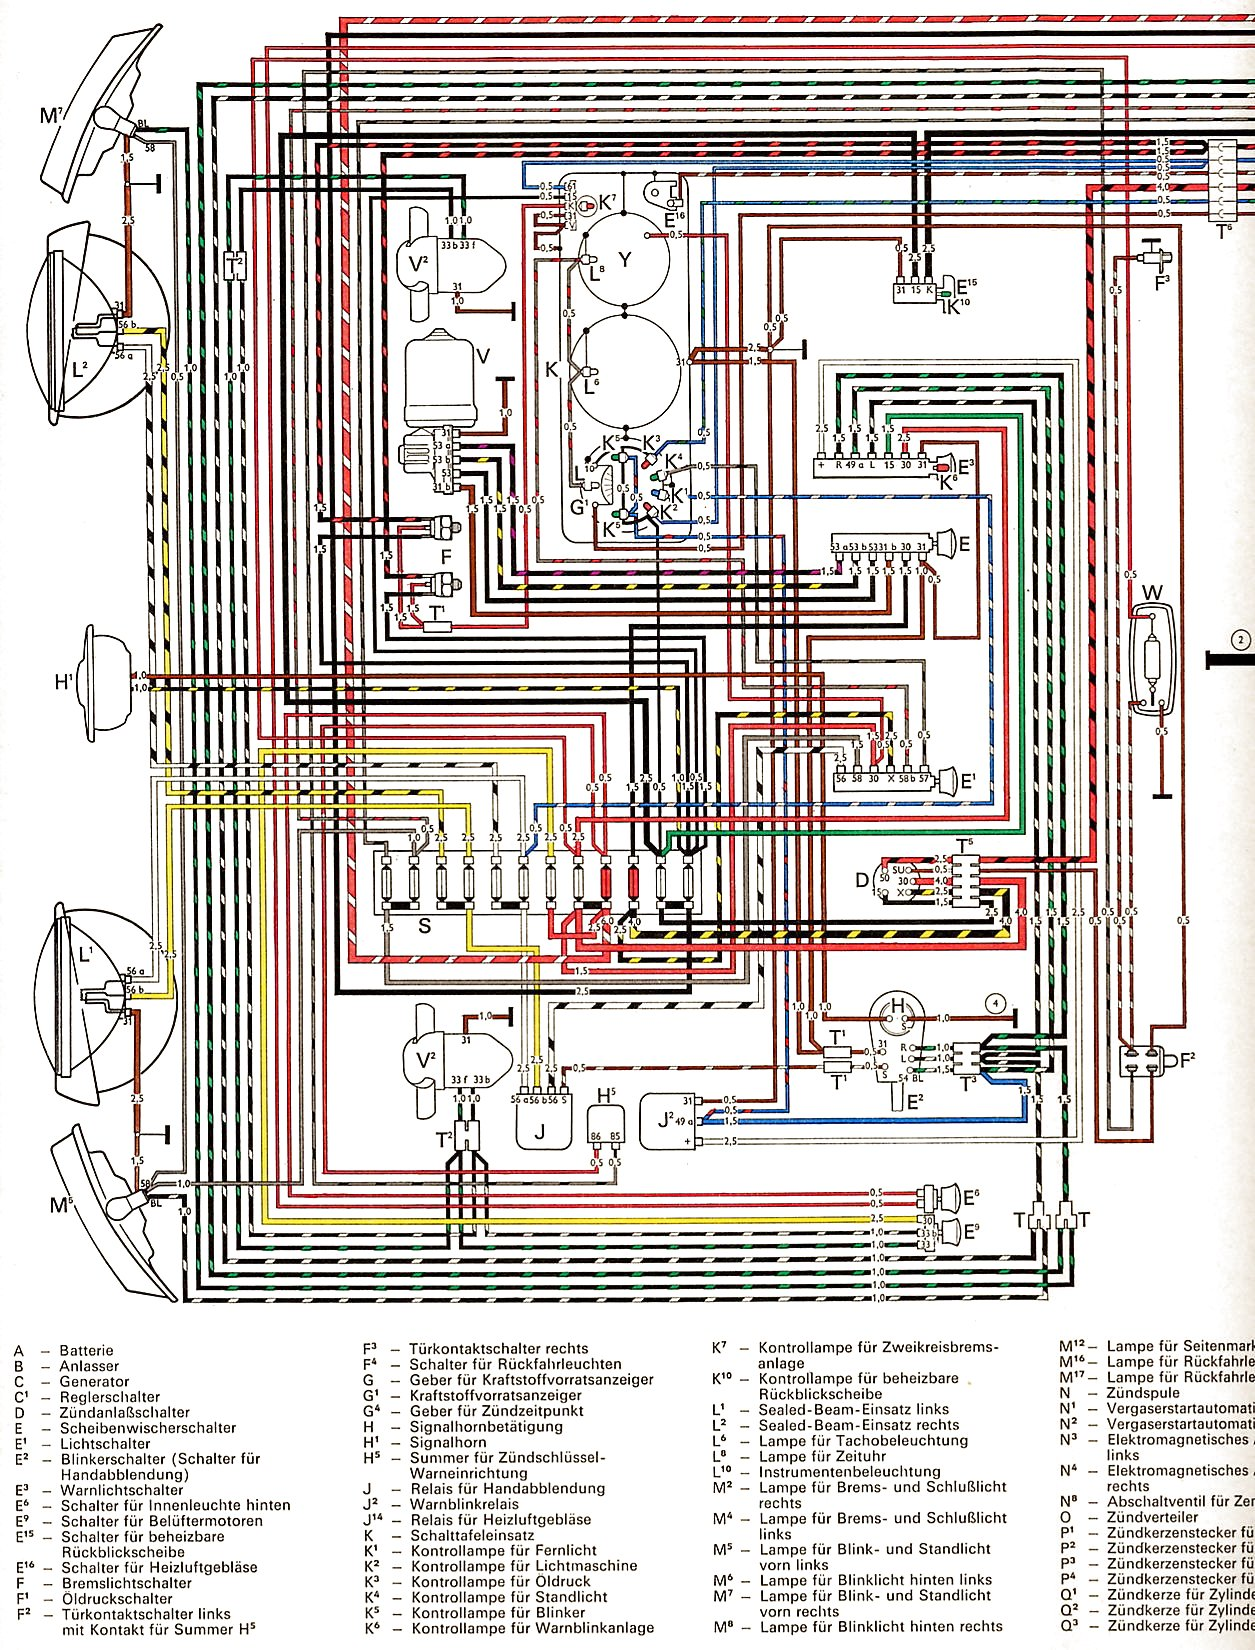 1971 vw transporter wiring diagram wiring library. Black Bedroom Furniture Sets. Home Design Ideas